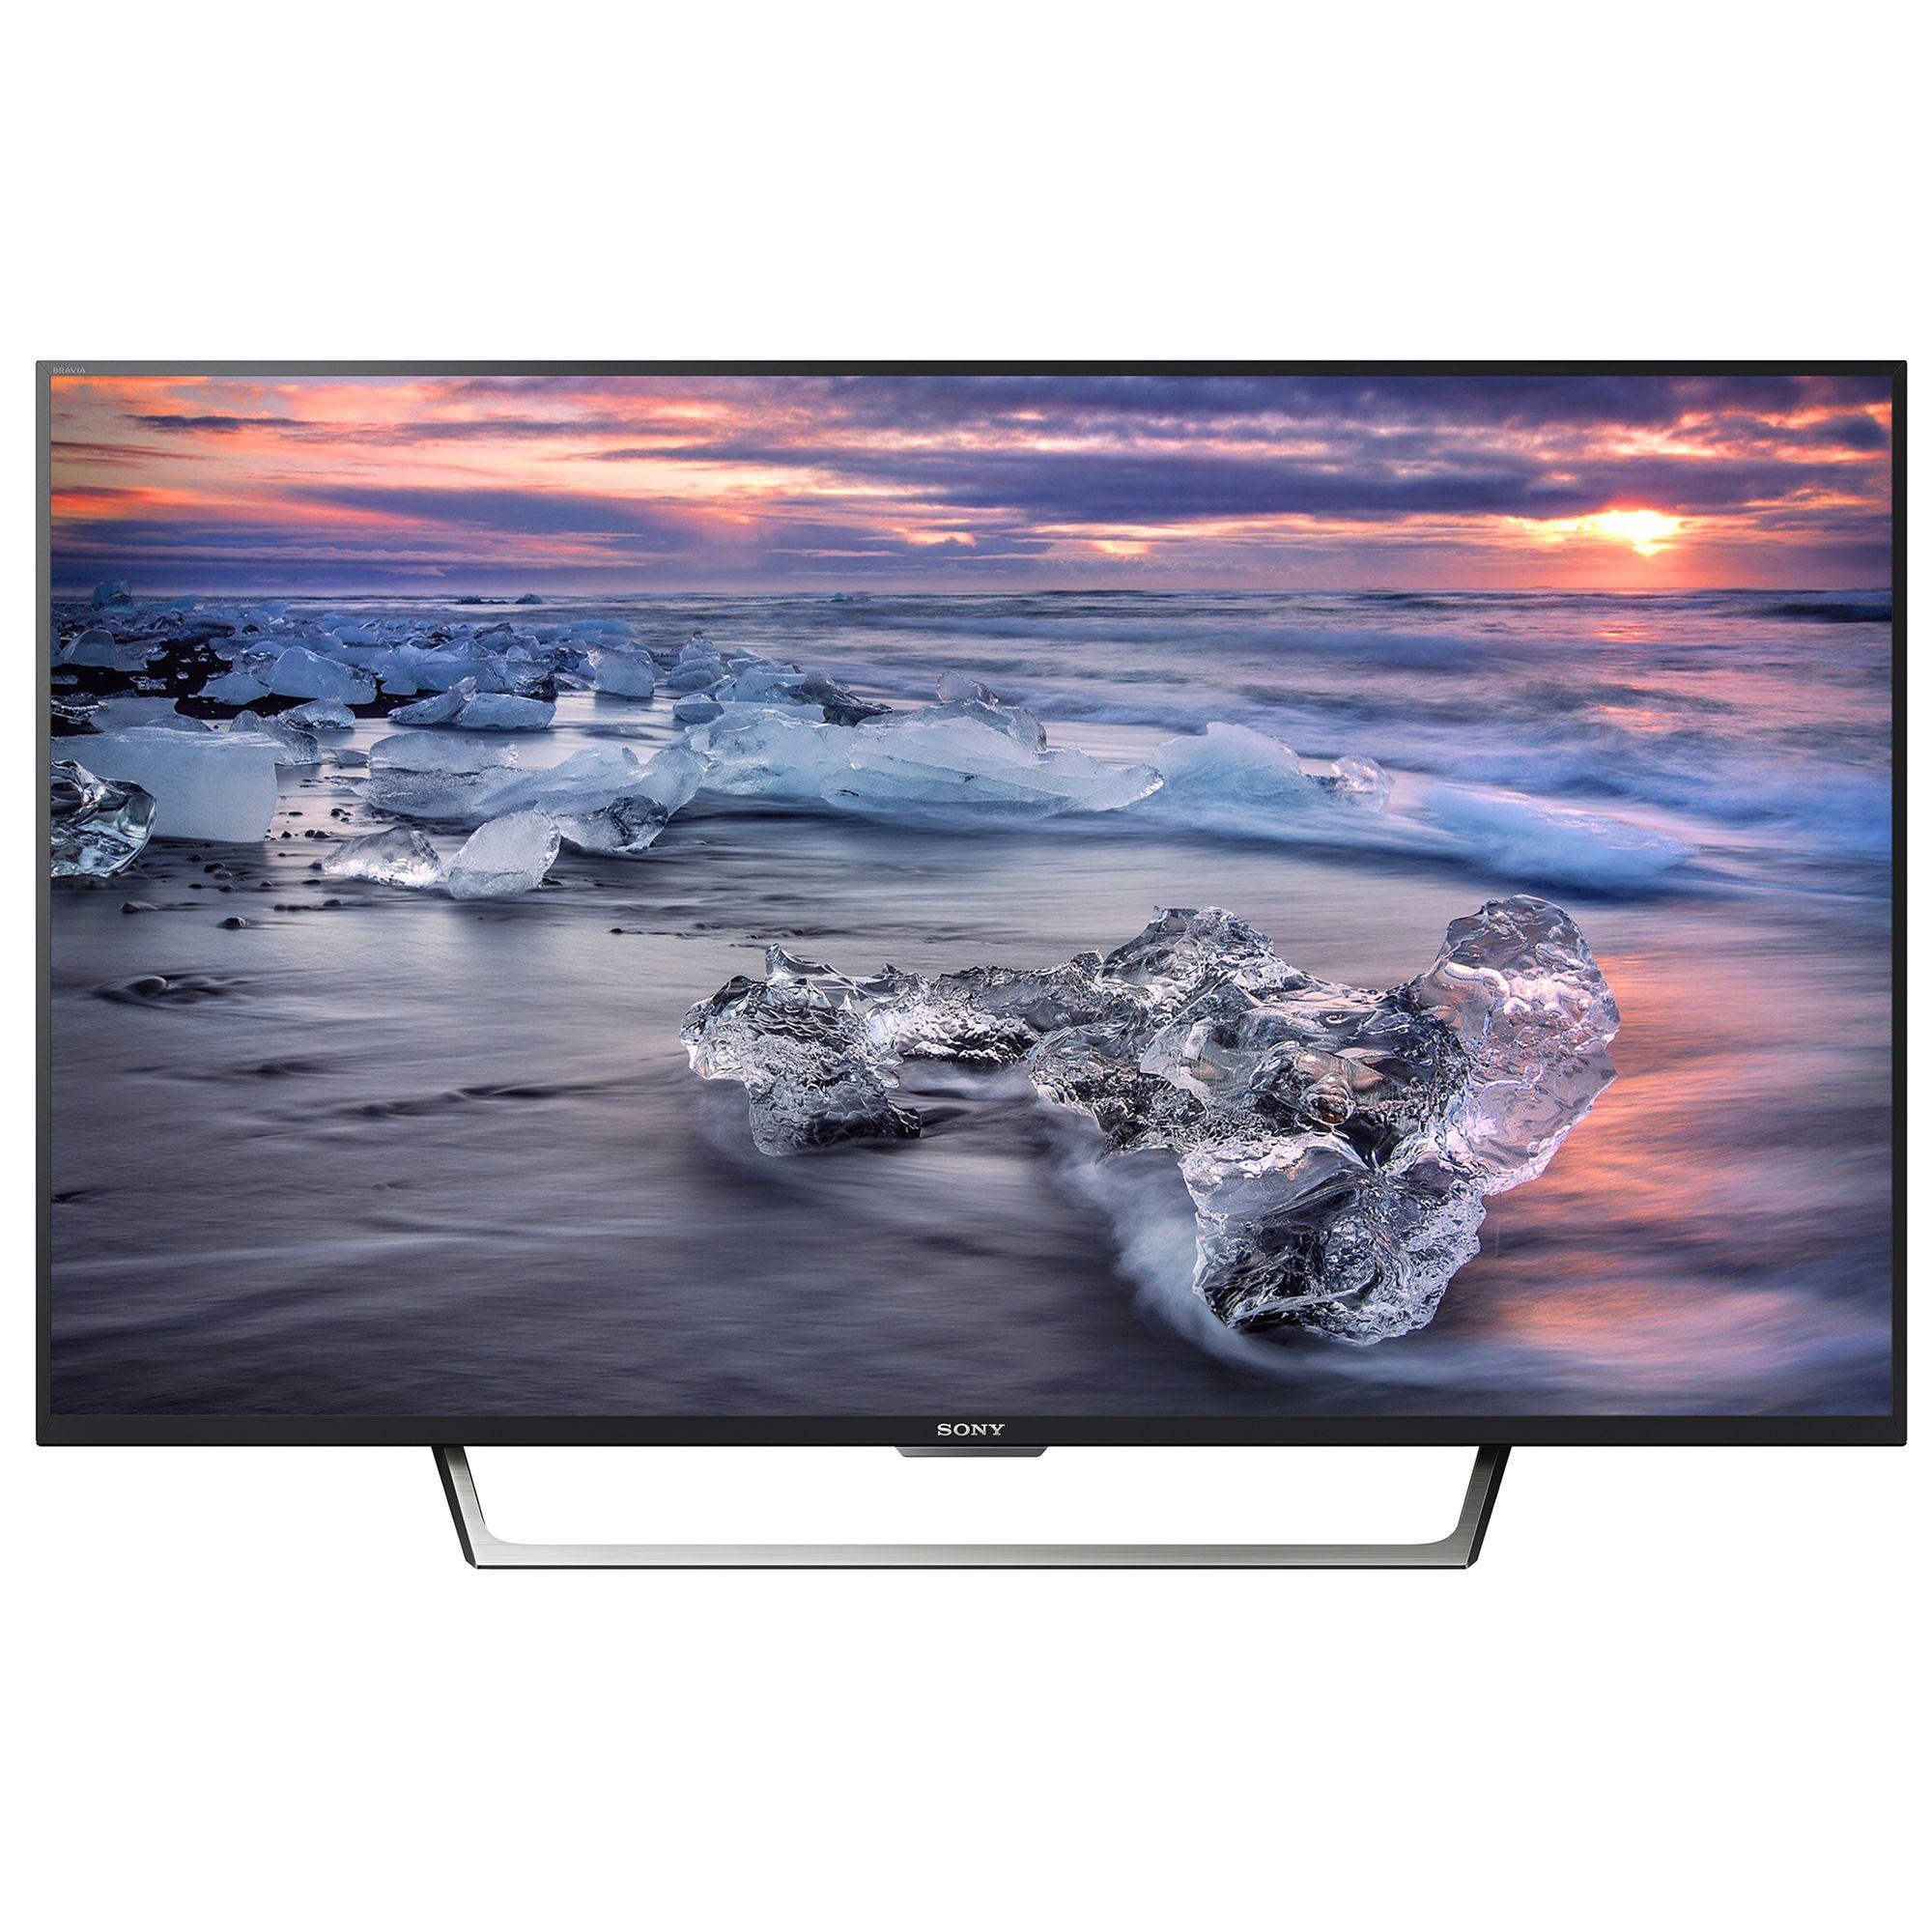 Televizor LED Sony Smart TV 43WE750 108cm Full HD Negru